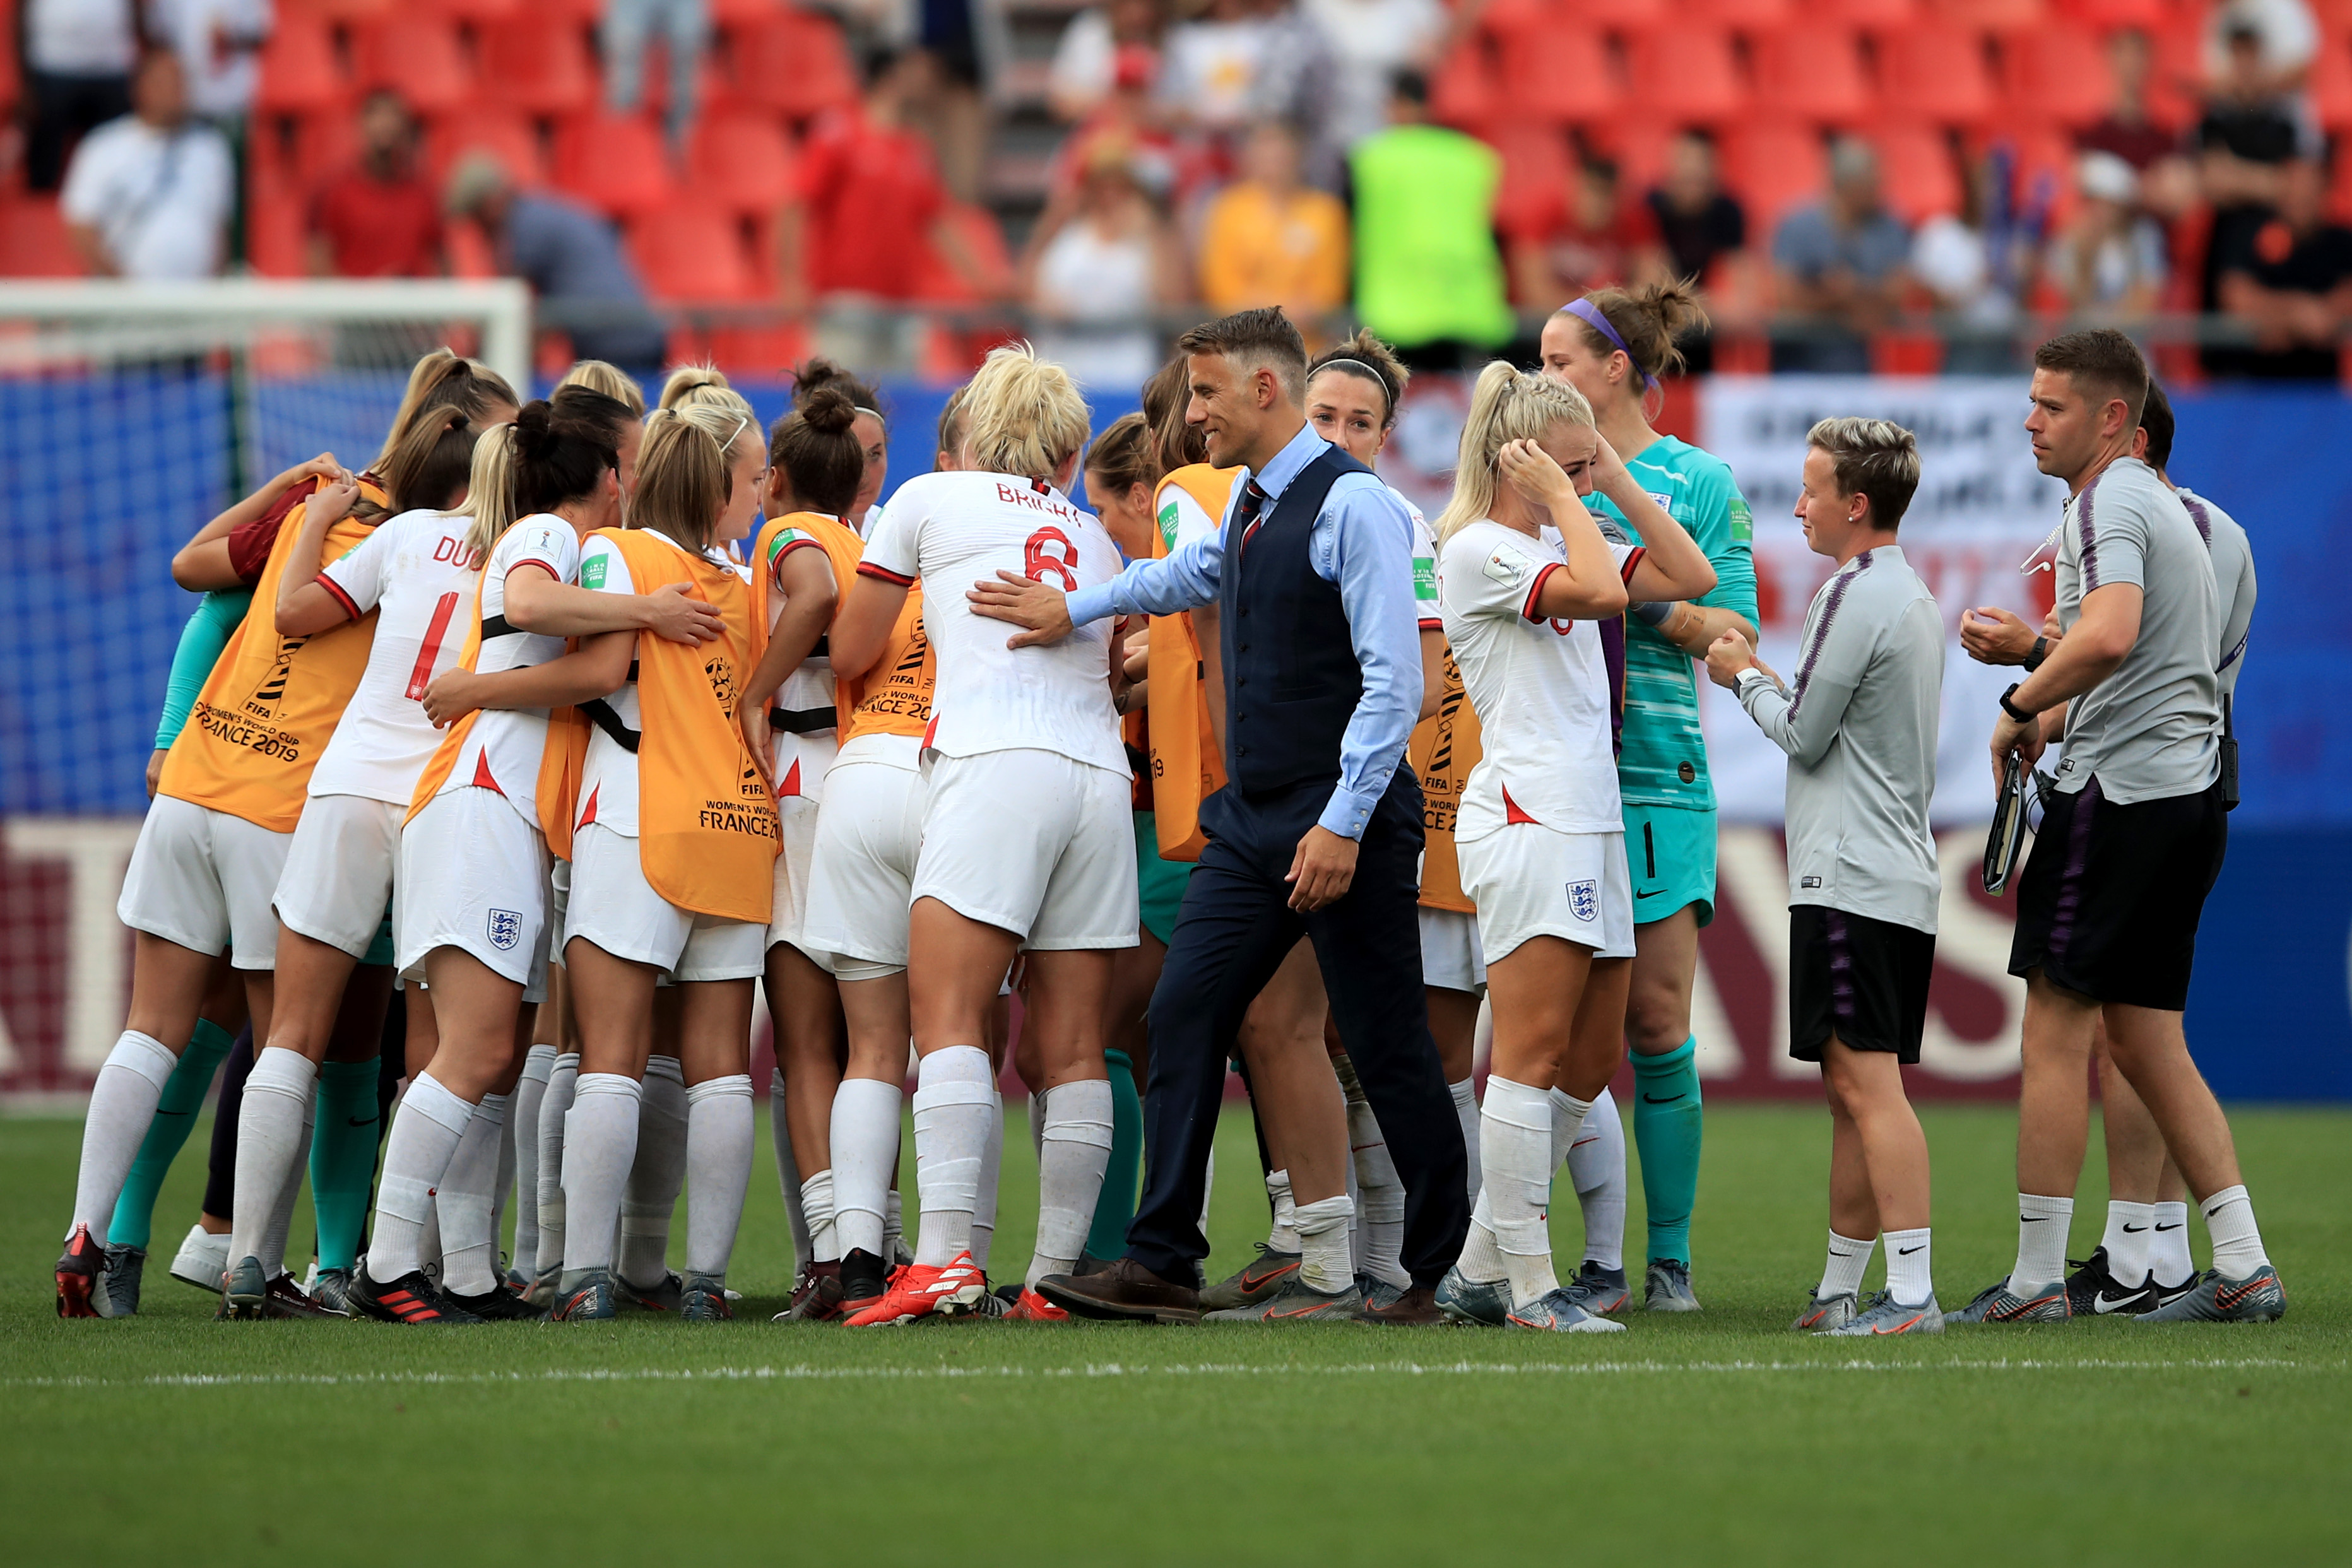 womens football teams arrive - HD3727×2485